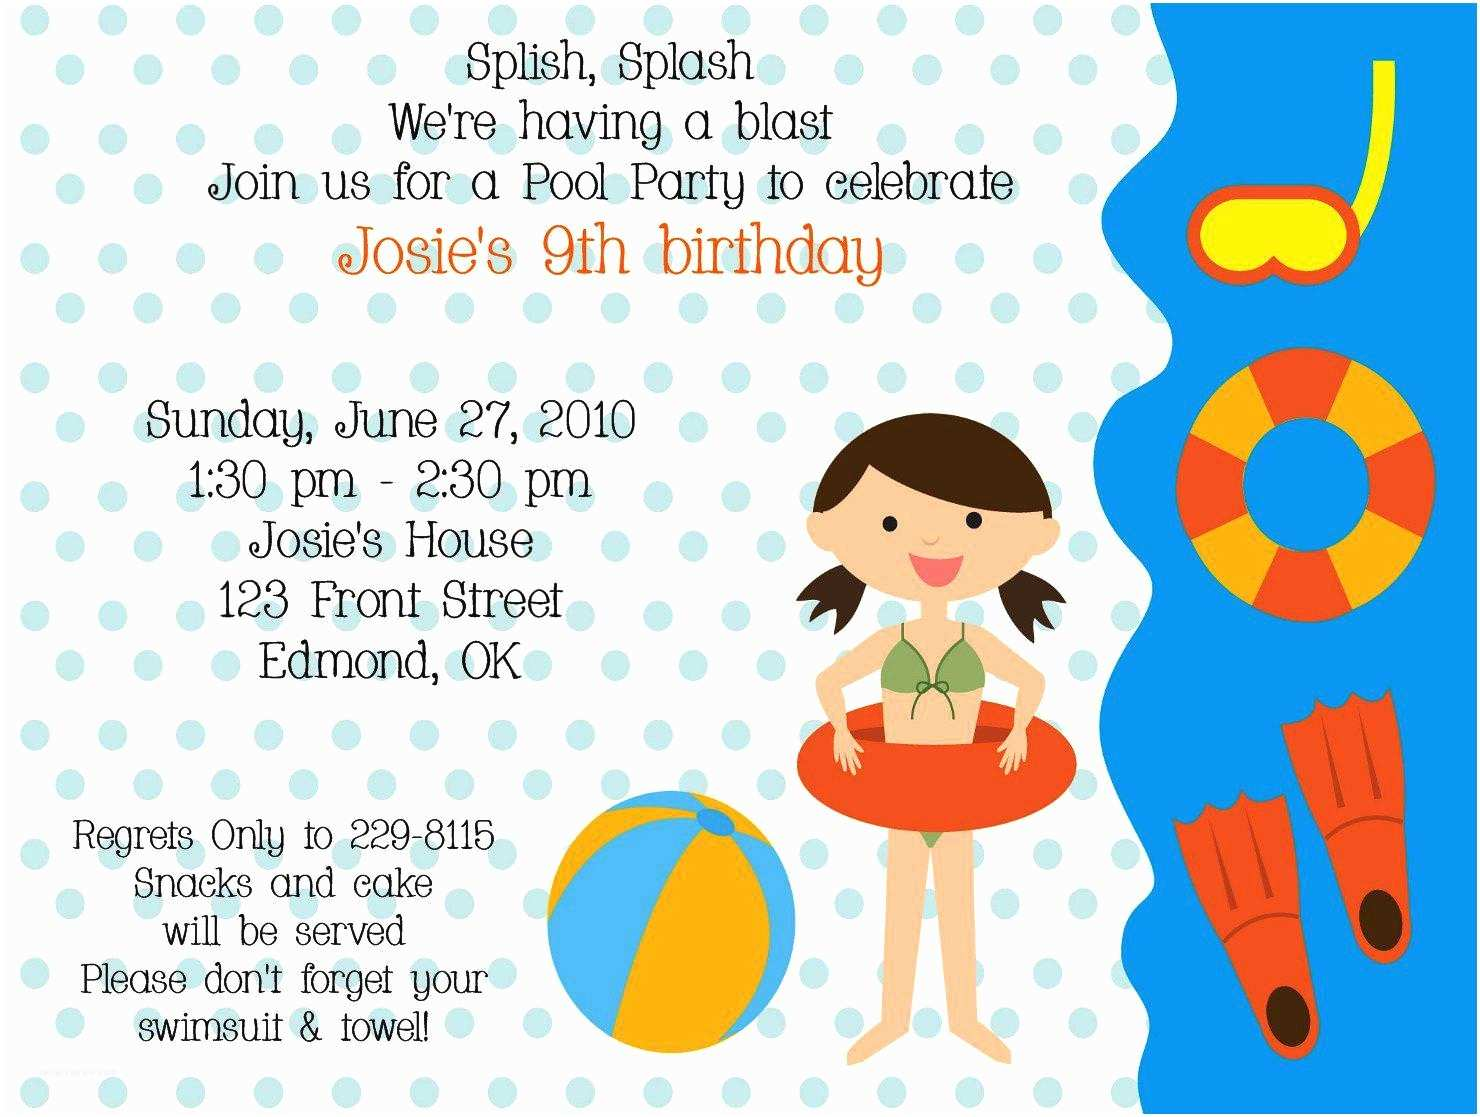 Kids Birthday Invitation Wording 21 Kids Birthday Invitation Wording that We Can Make